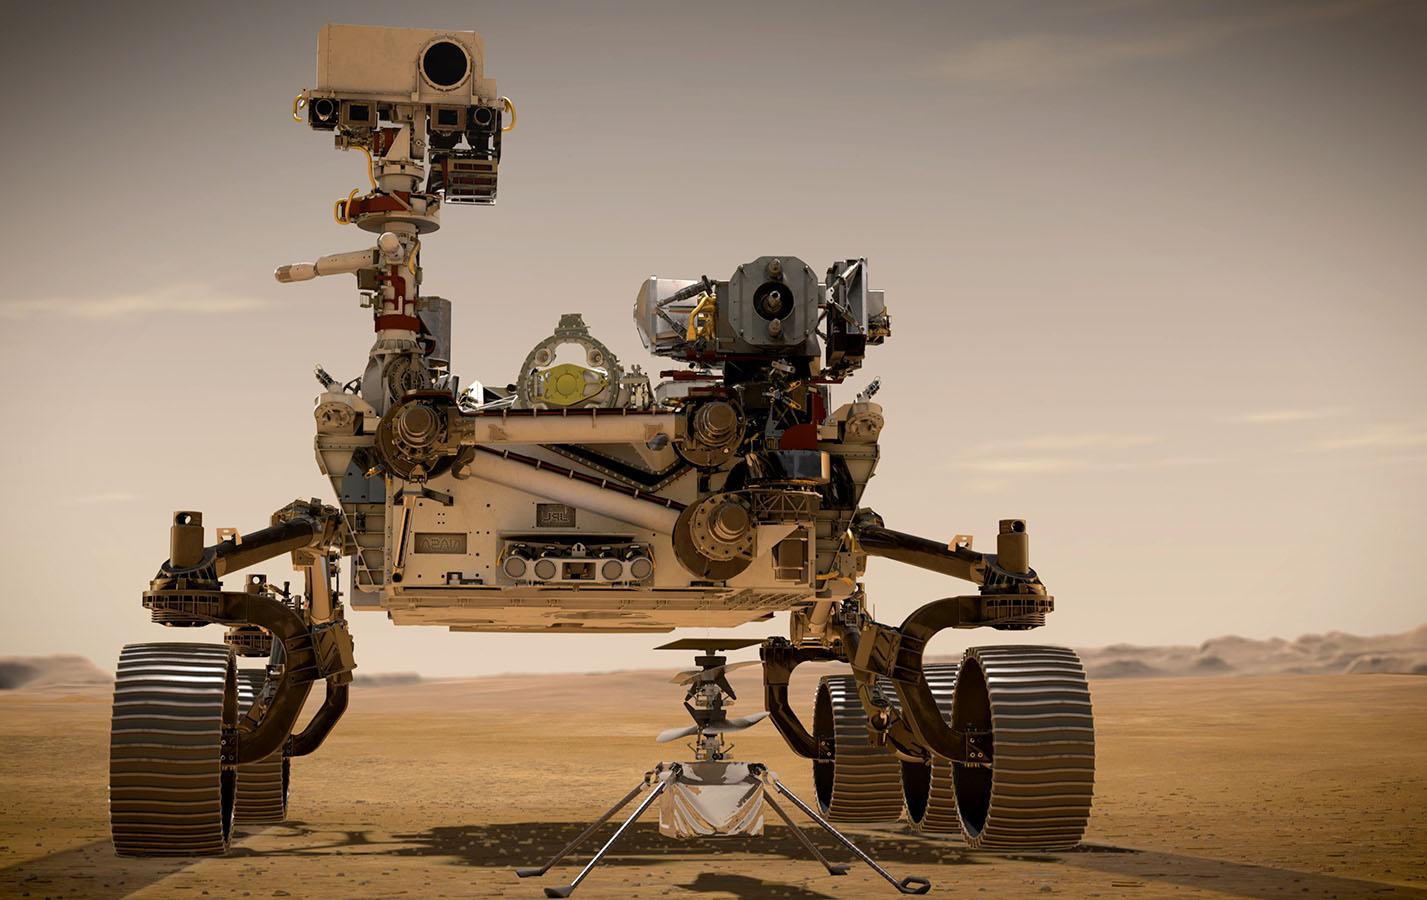 Artist's concept of the Mars rover Perseverance. Image credit: NASA/JPL-Caltech